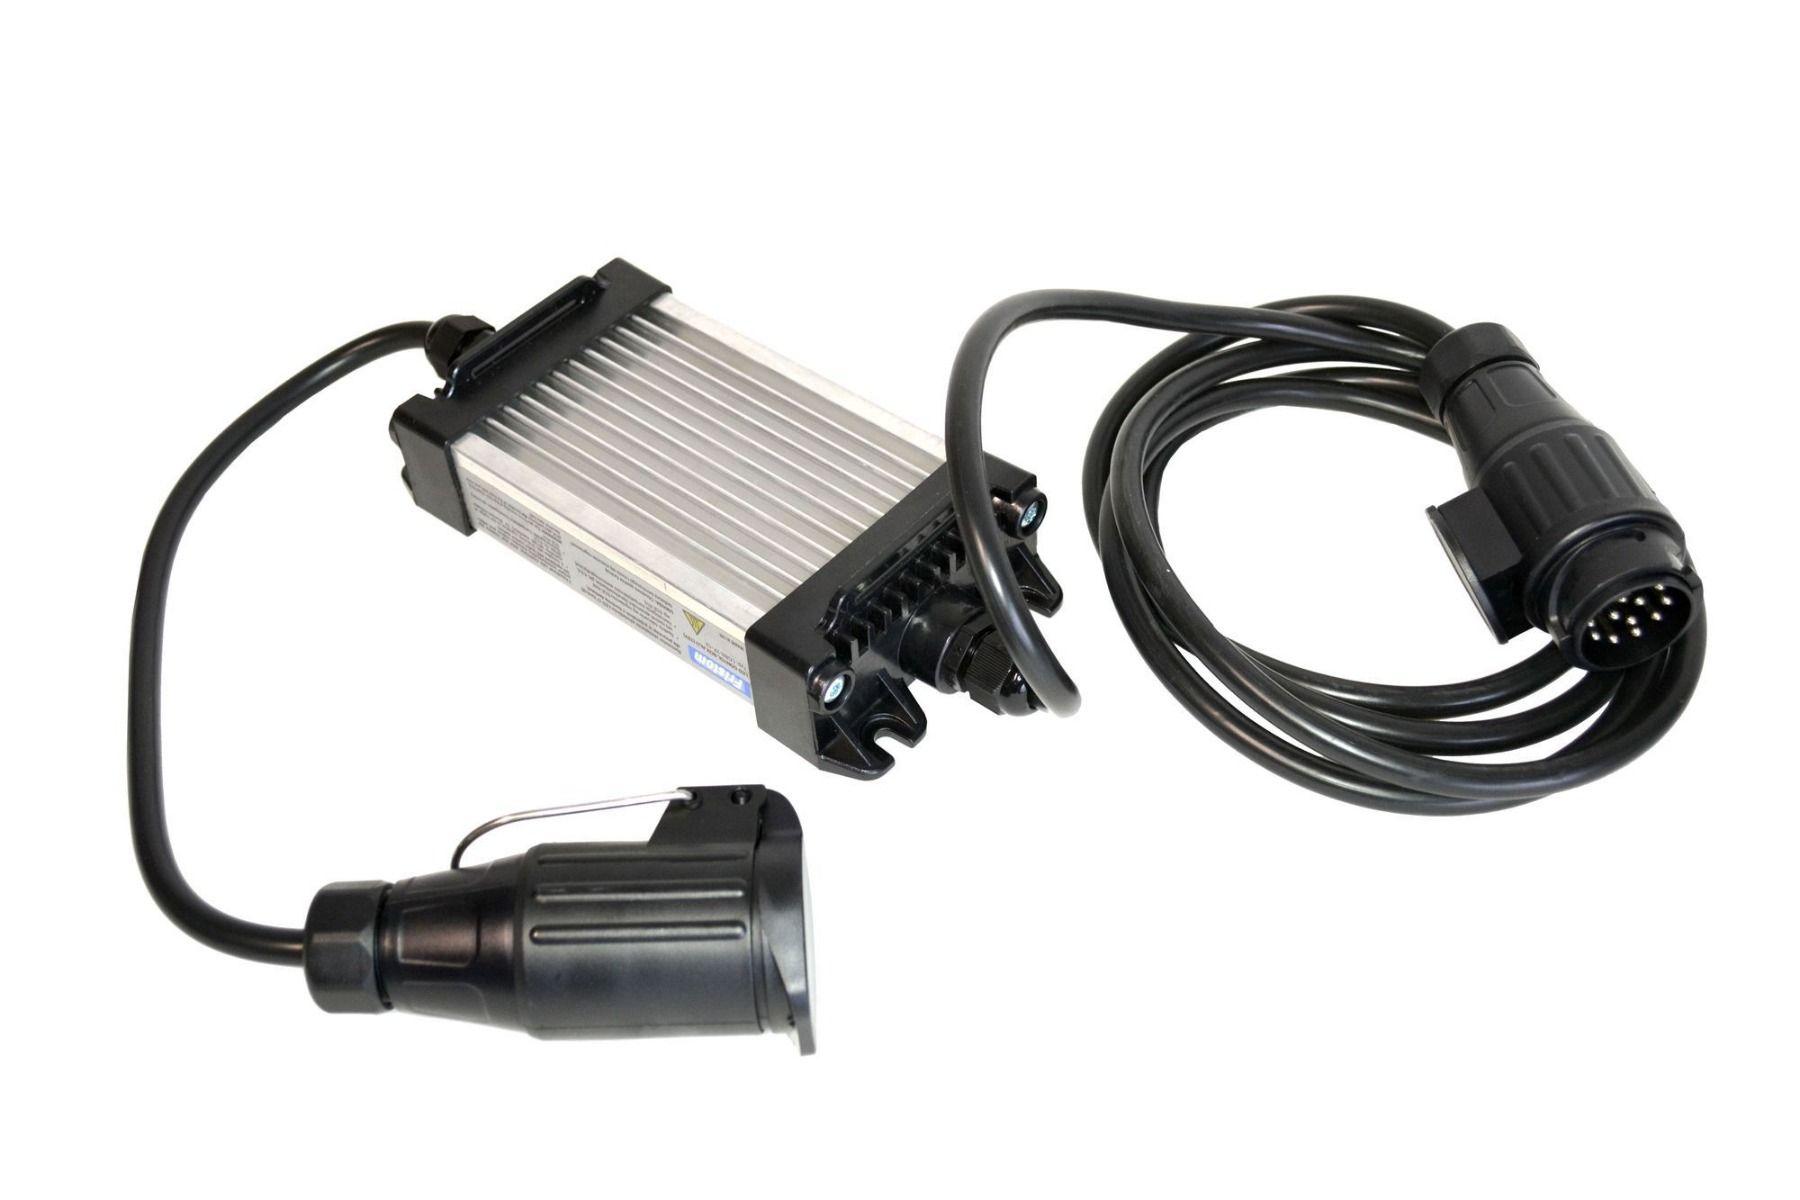 LED convertor